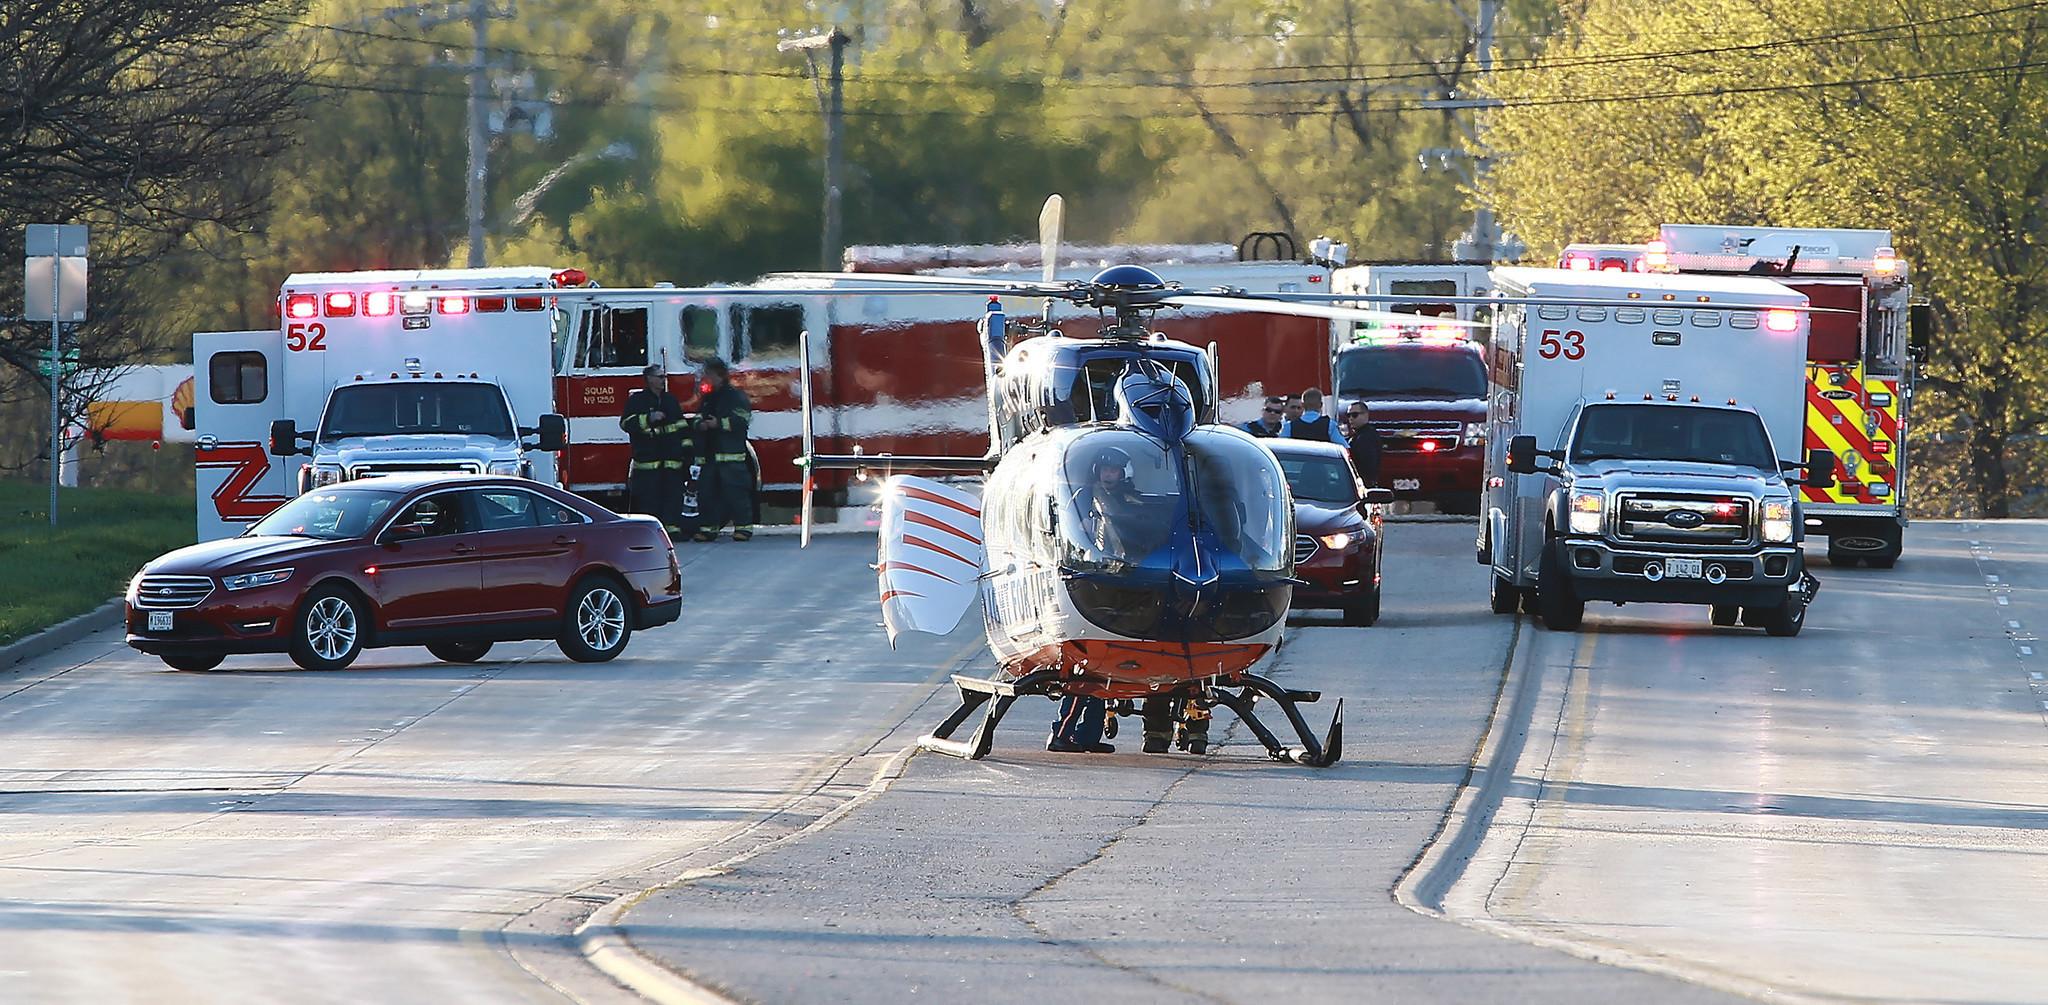 news harnett county killed when leaves road hits tree